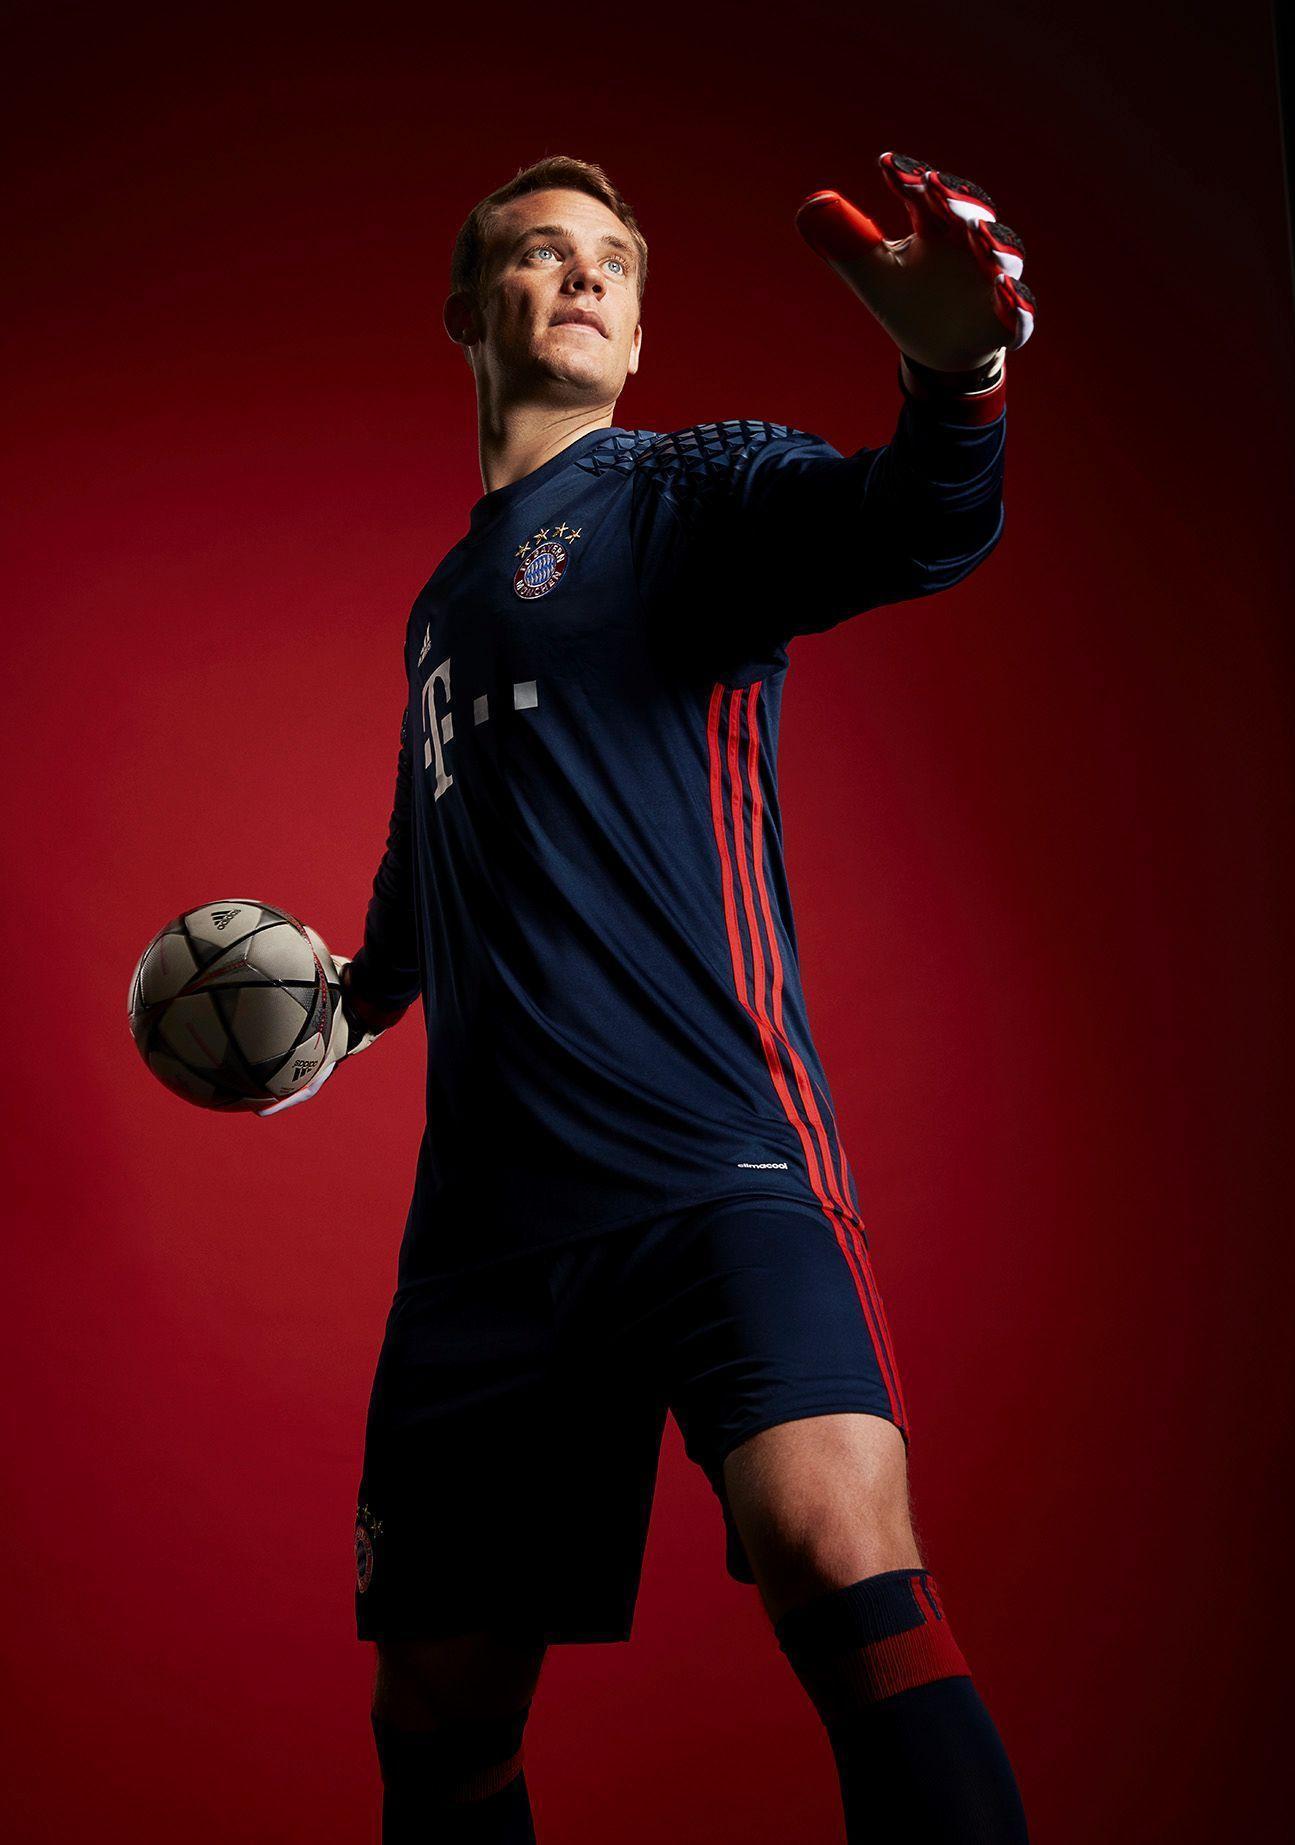 Chia sẻ của HLV Joachim Low về Neuer